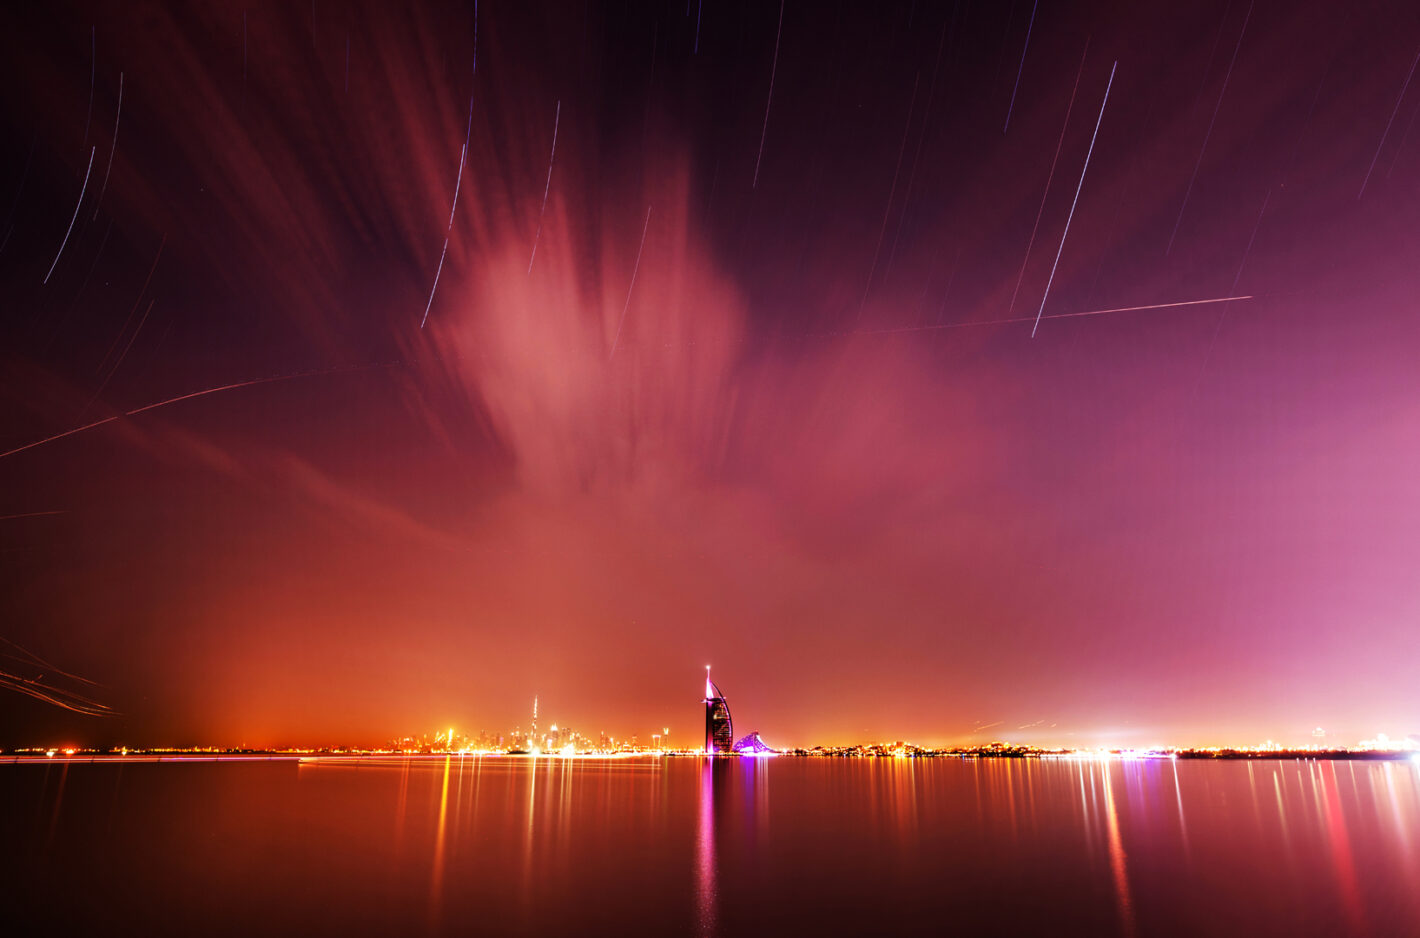 Dubai star show. Canon 6DmII, 16-35mm, 30sec, 120 pix, 400 iso, f7.1